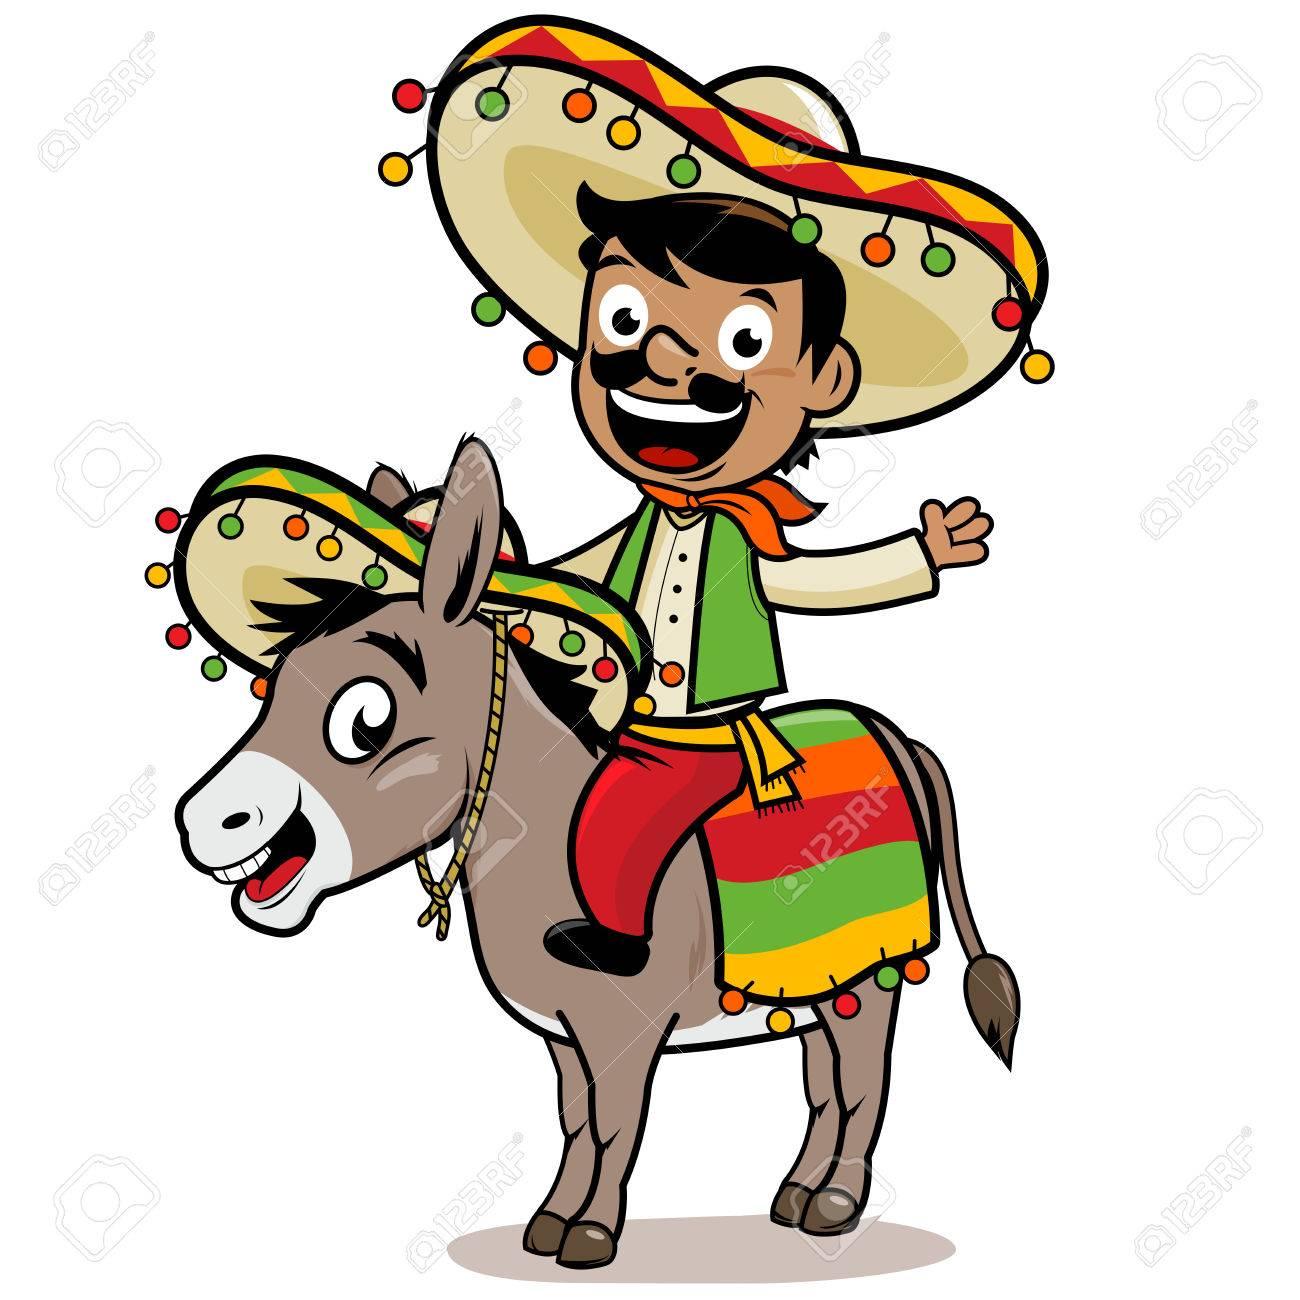 Mexican man riding a donkey.